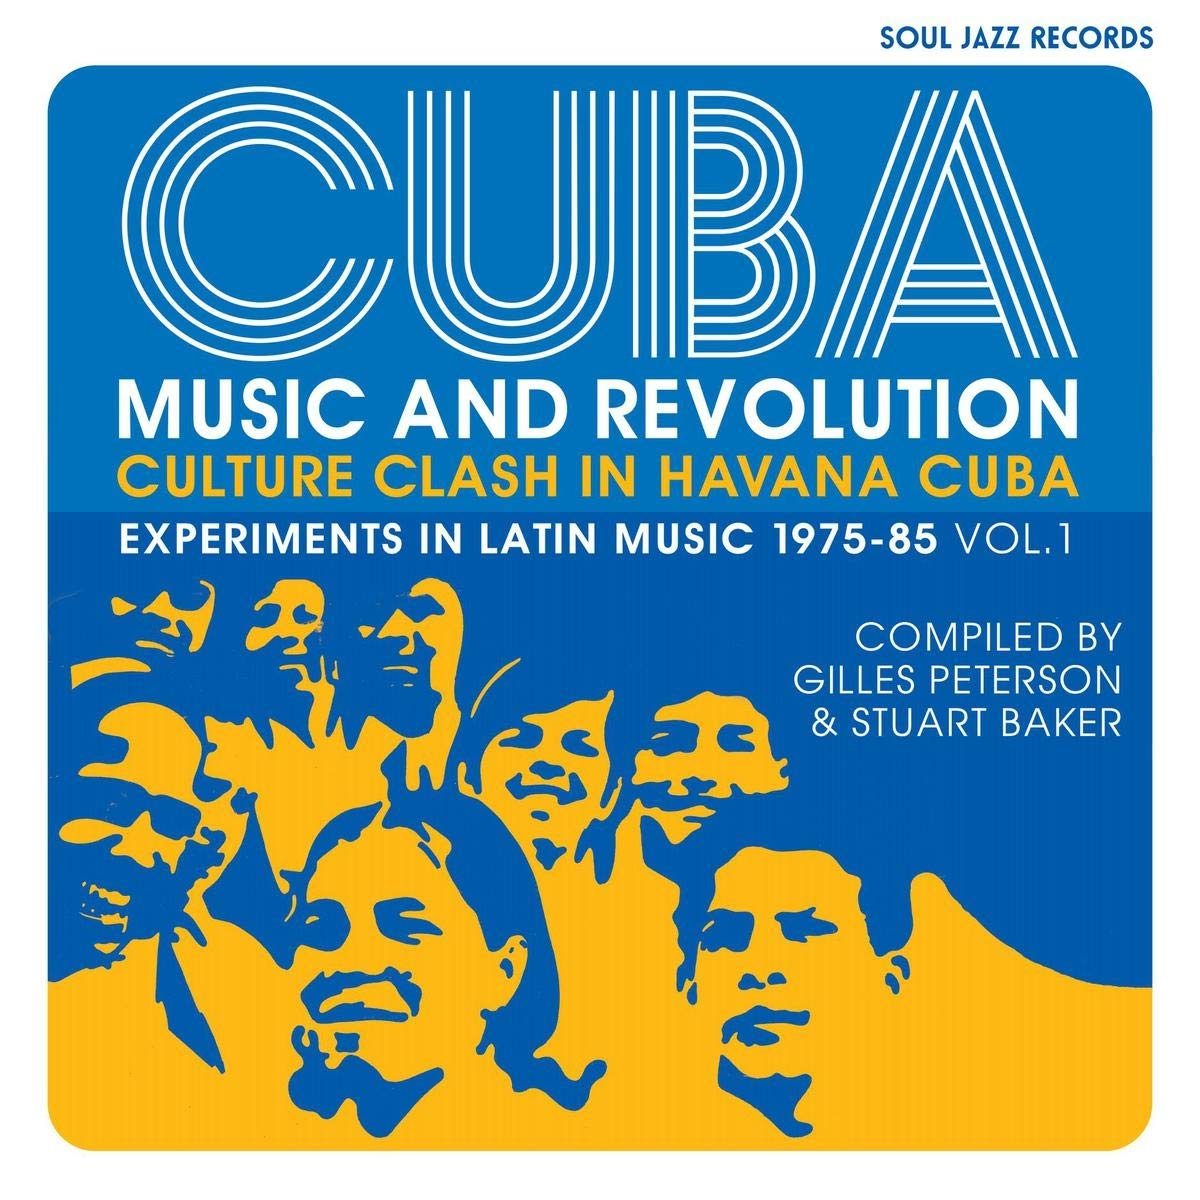 VA - Cuba Music and Revolution  Experiments in Latin Music 1975-85 Vol.1 (2021) [FLAC] Download